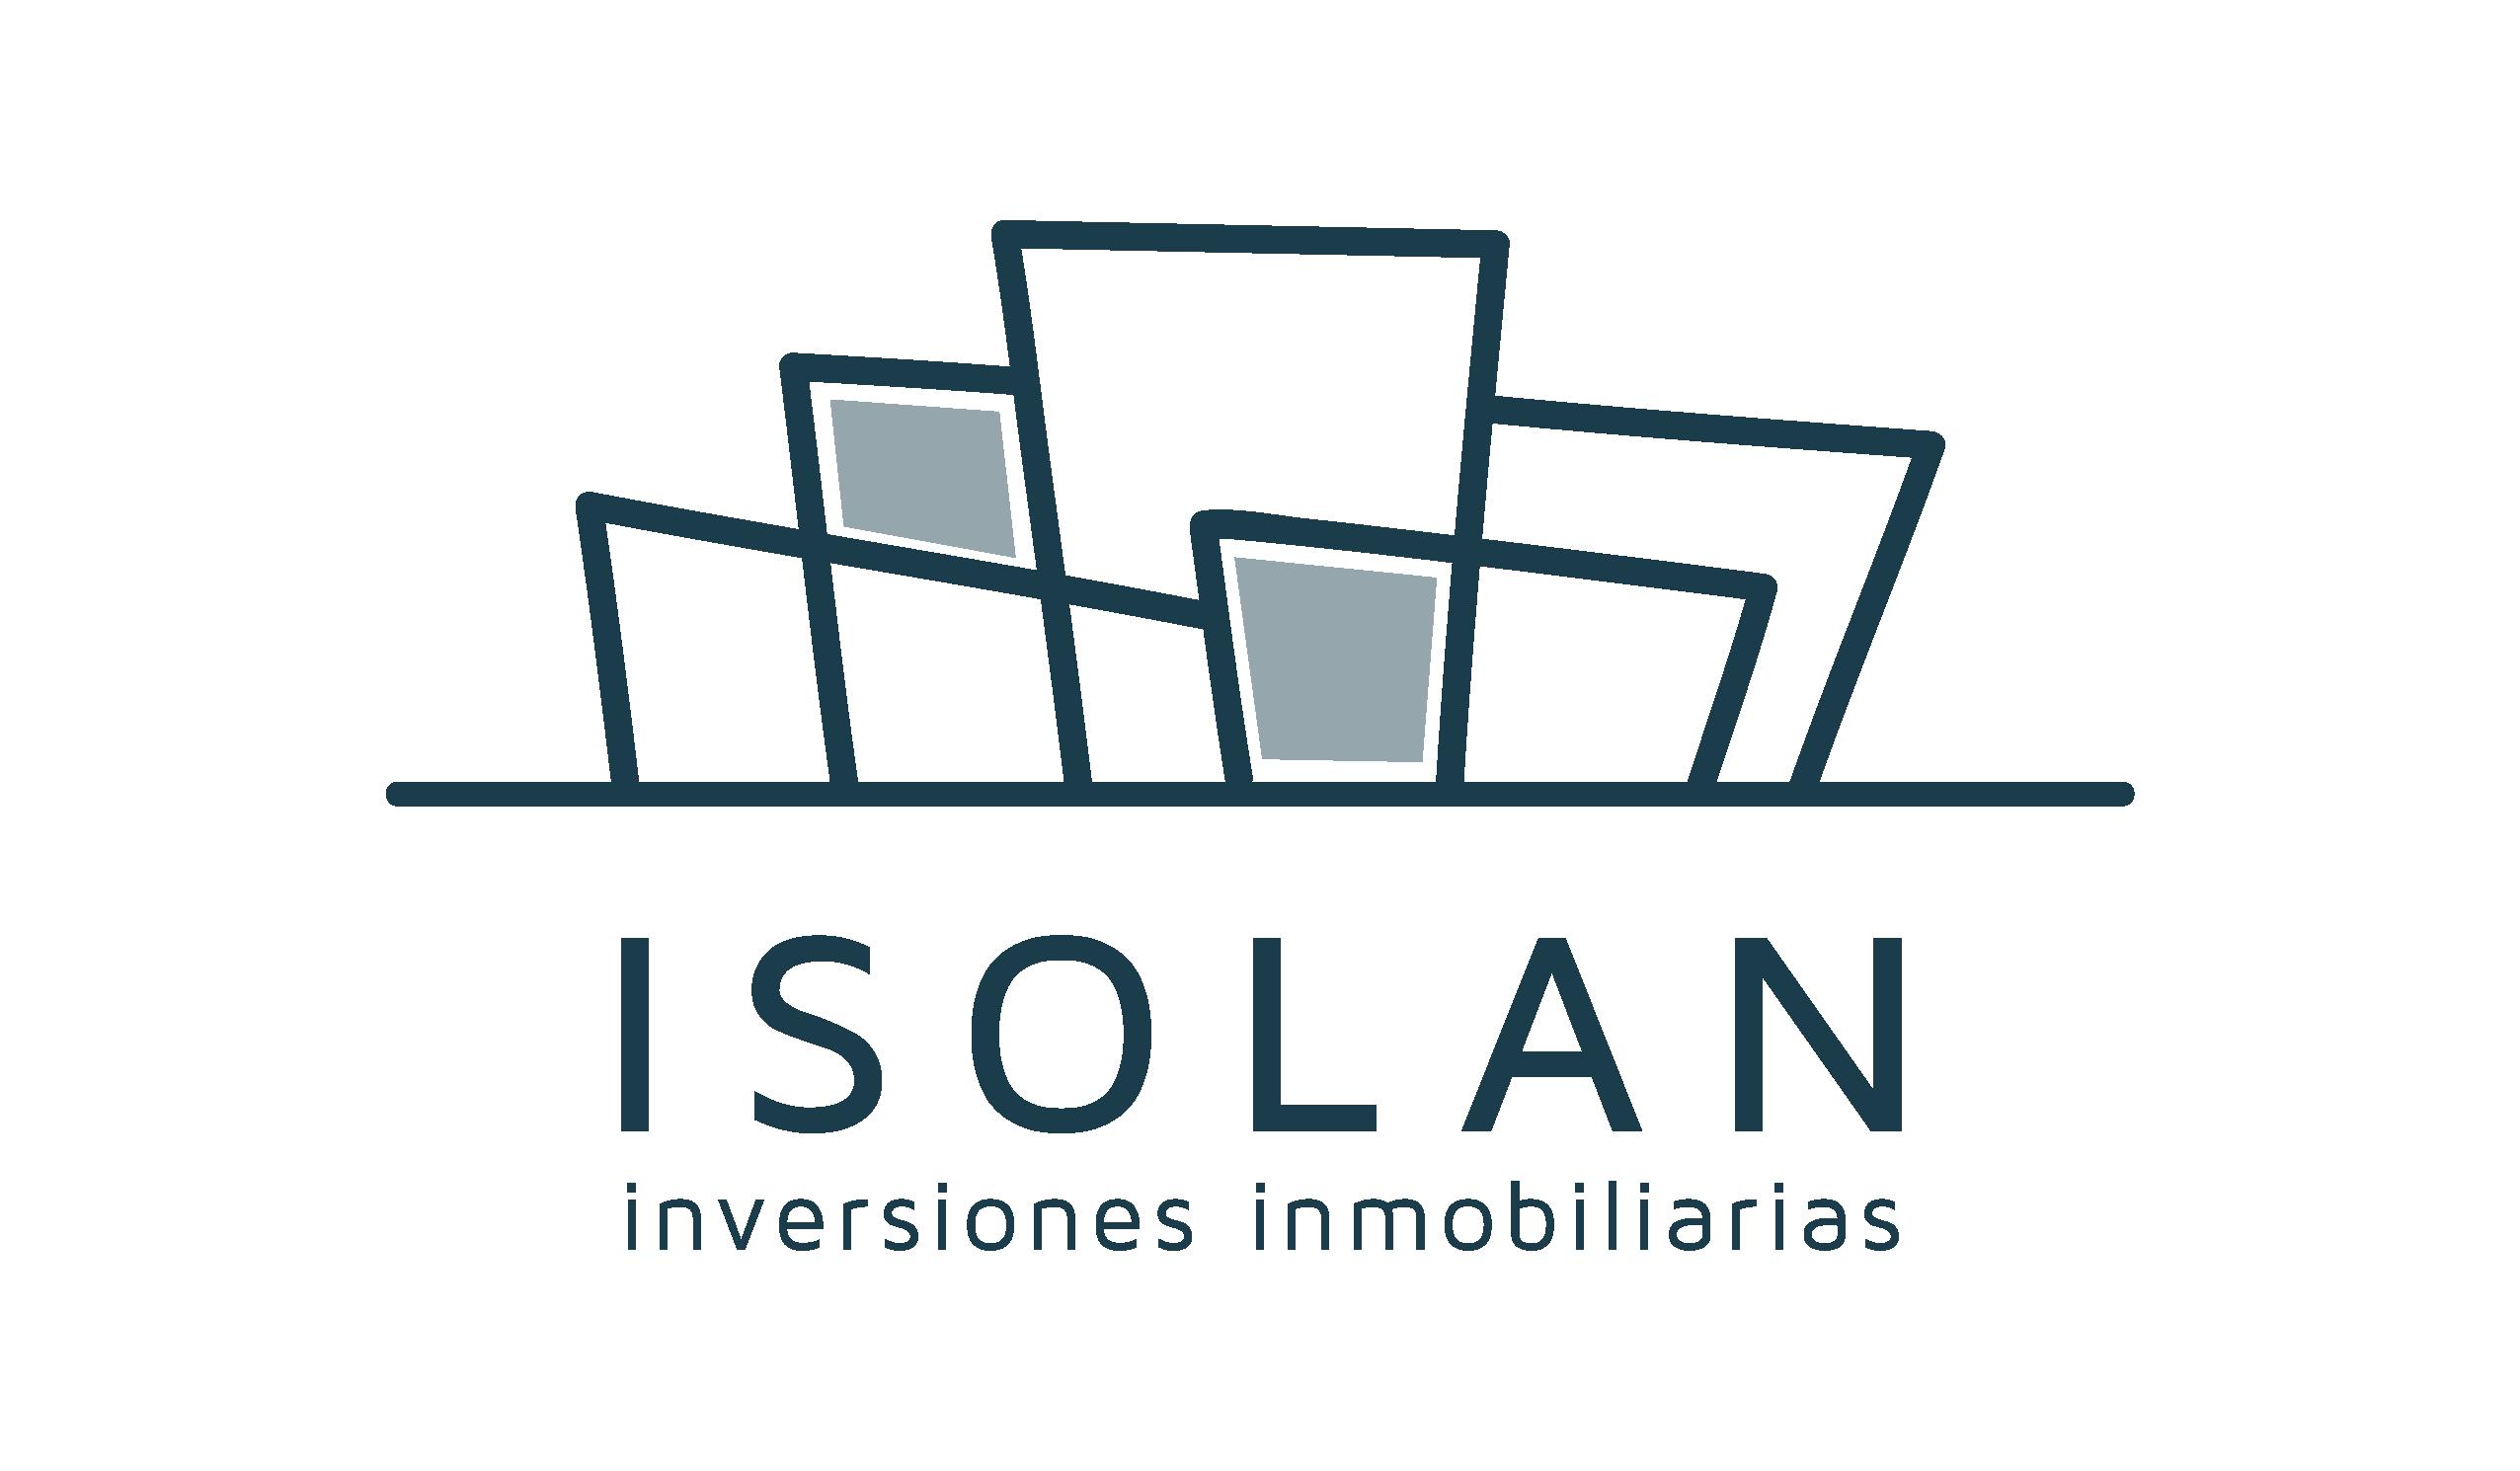 Isolan.net